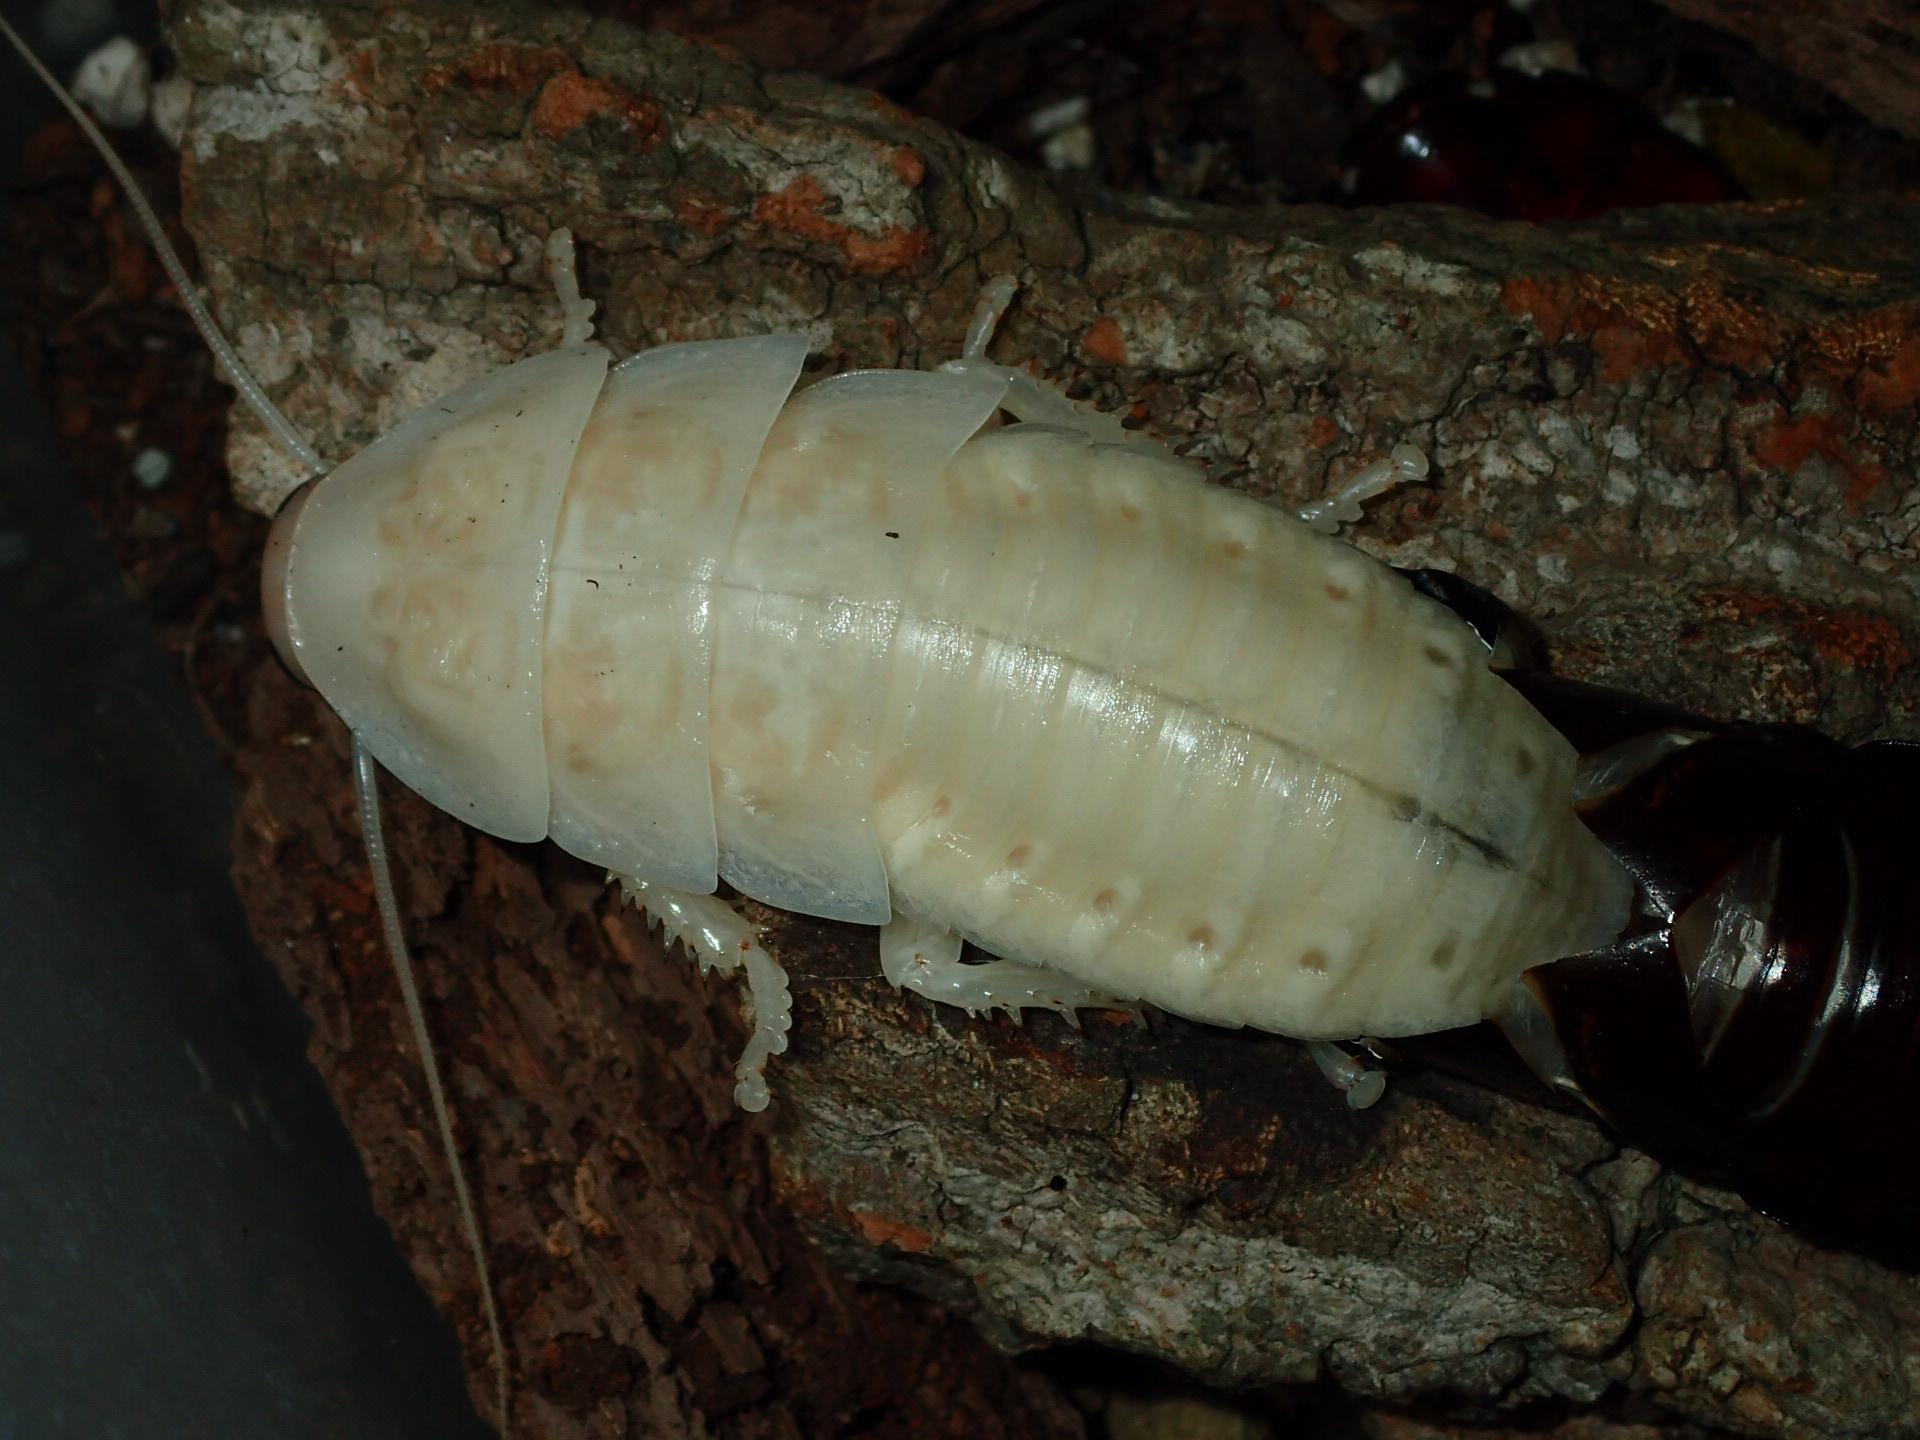 Hissing Roach - Fresh exoskeleon